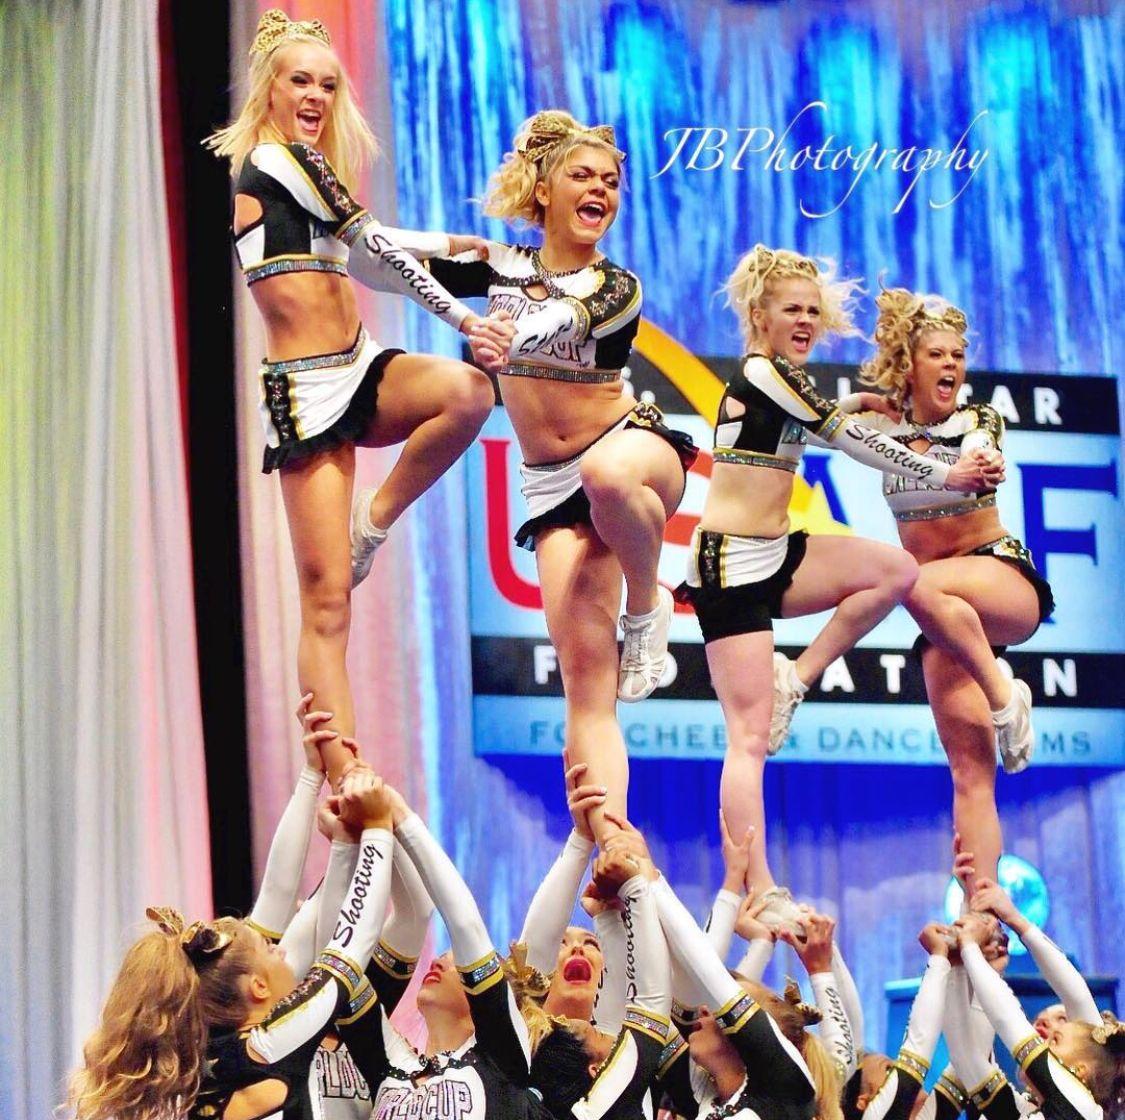 Shooting Stars Worlds 2017 In 2020 Cheerleading All Star Cheer